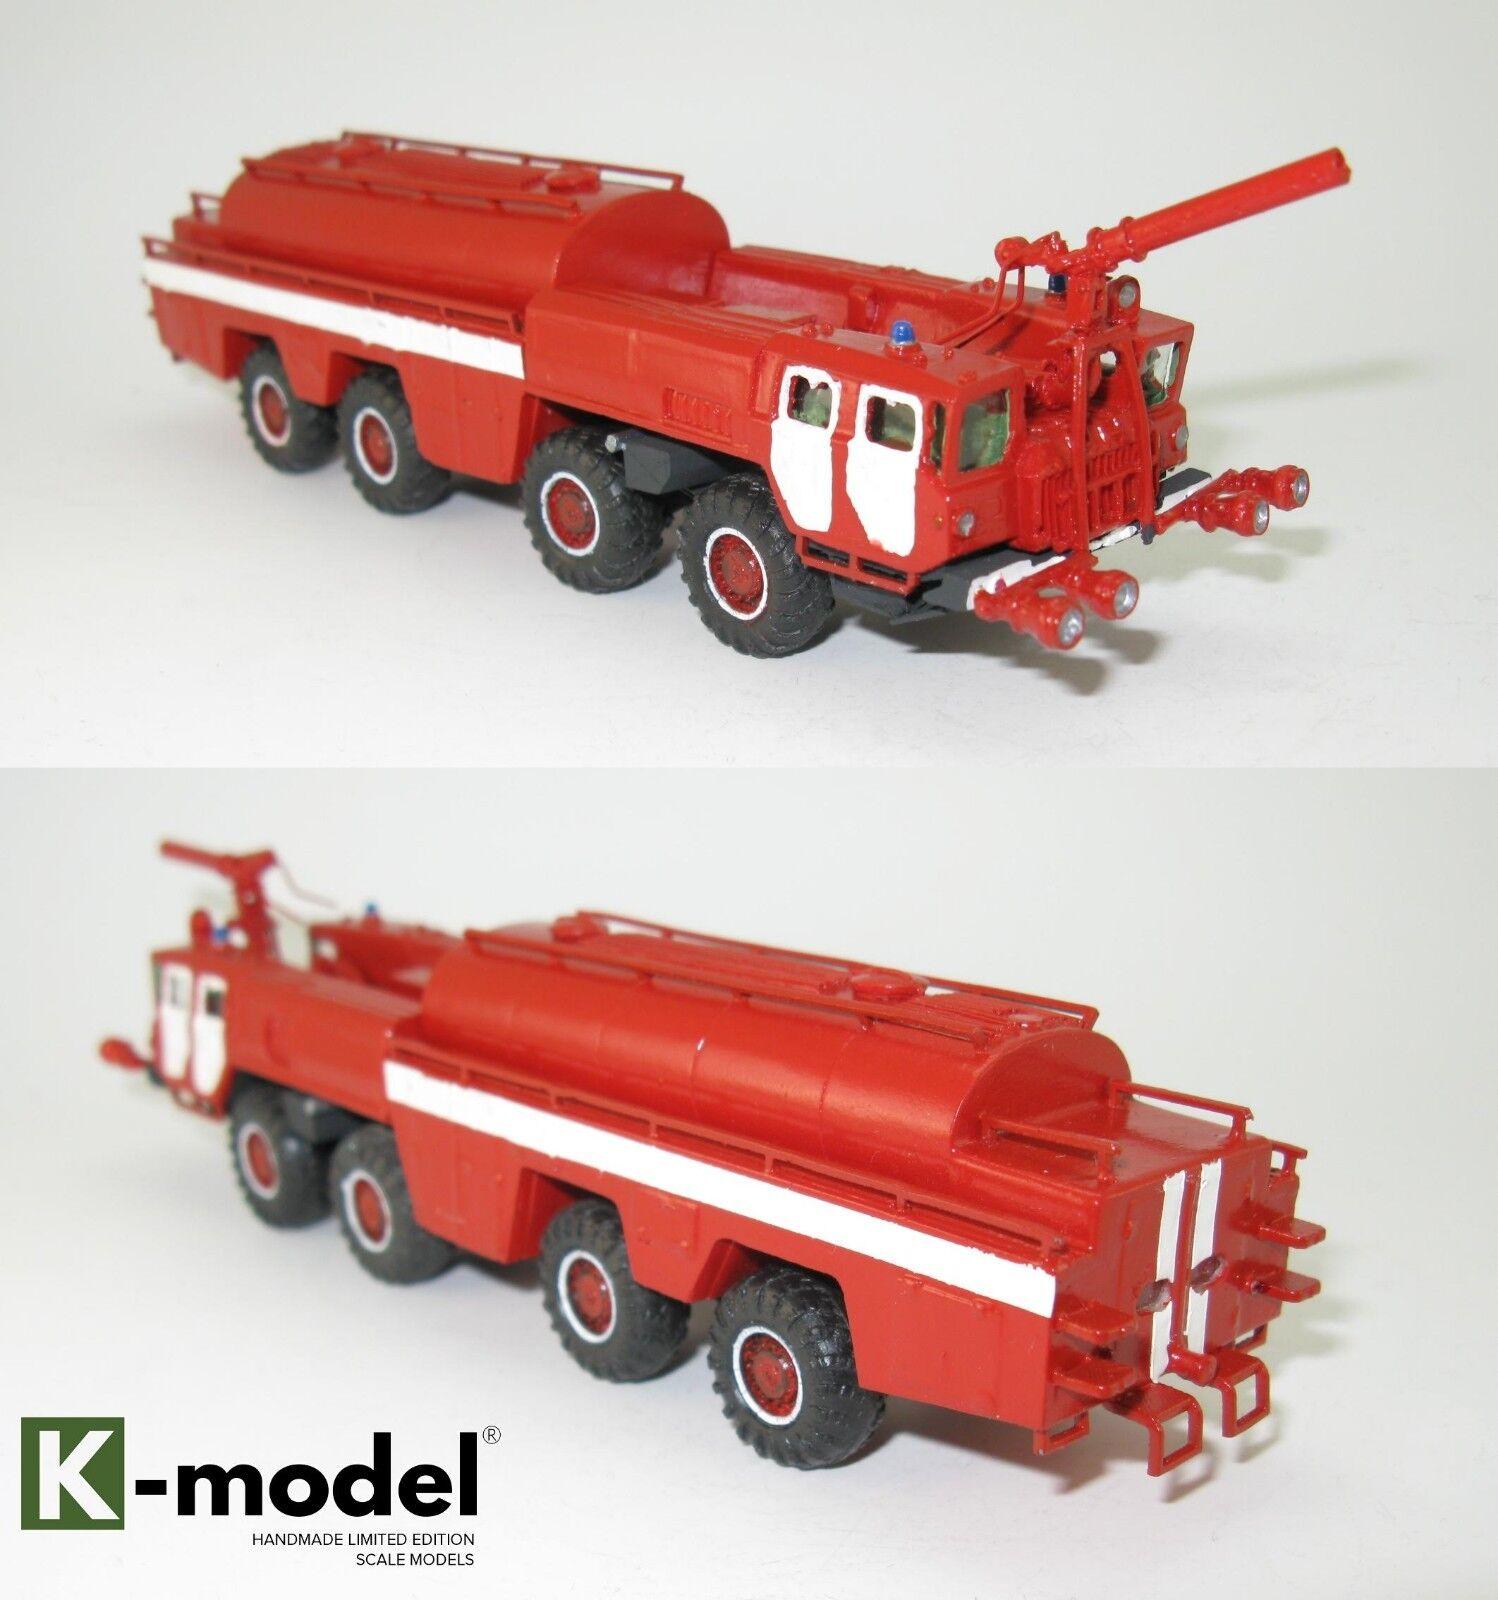 Maz-543 aa-60 (543) -160 pesado flughafenlöschfahrzeug urss - 1 87 ho nuevo